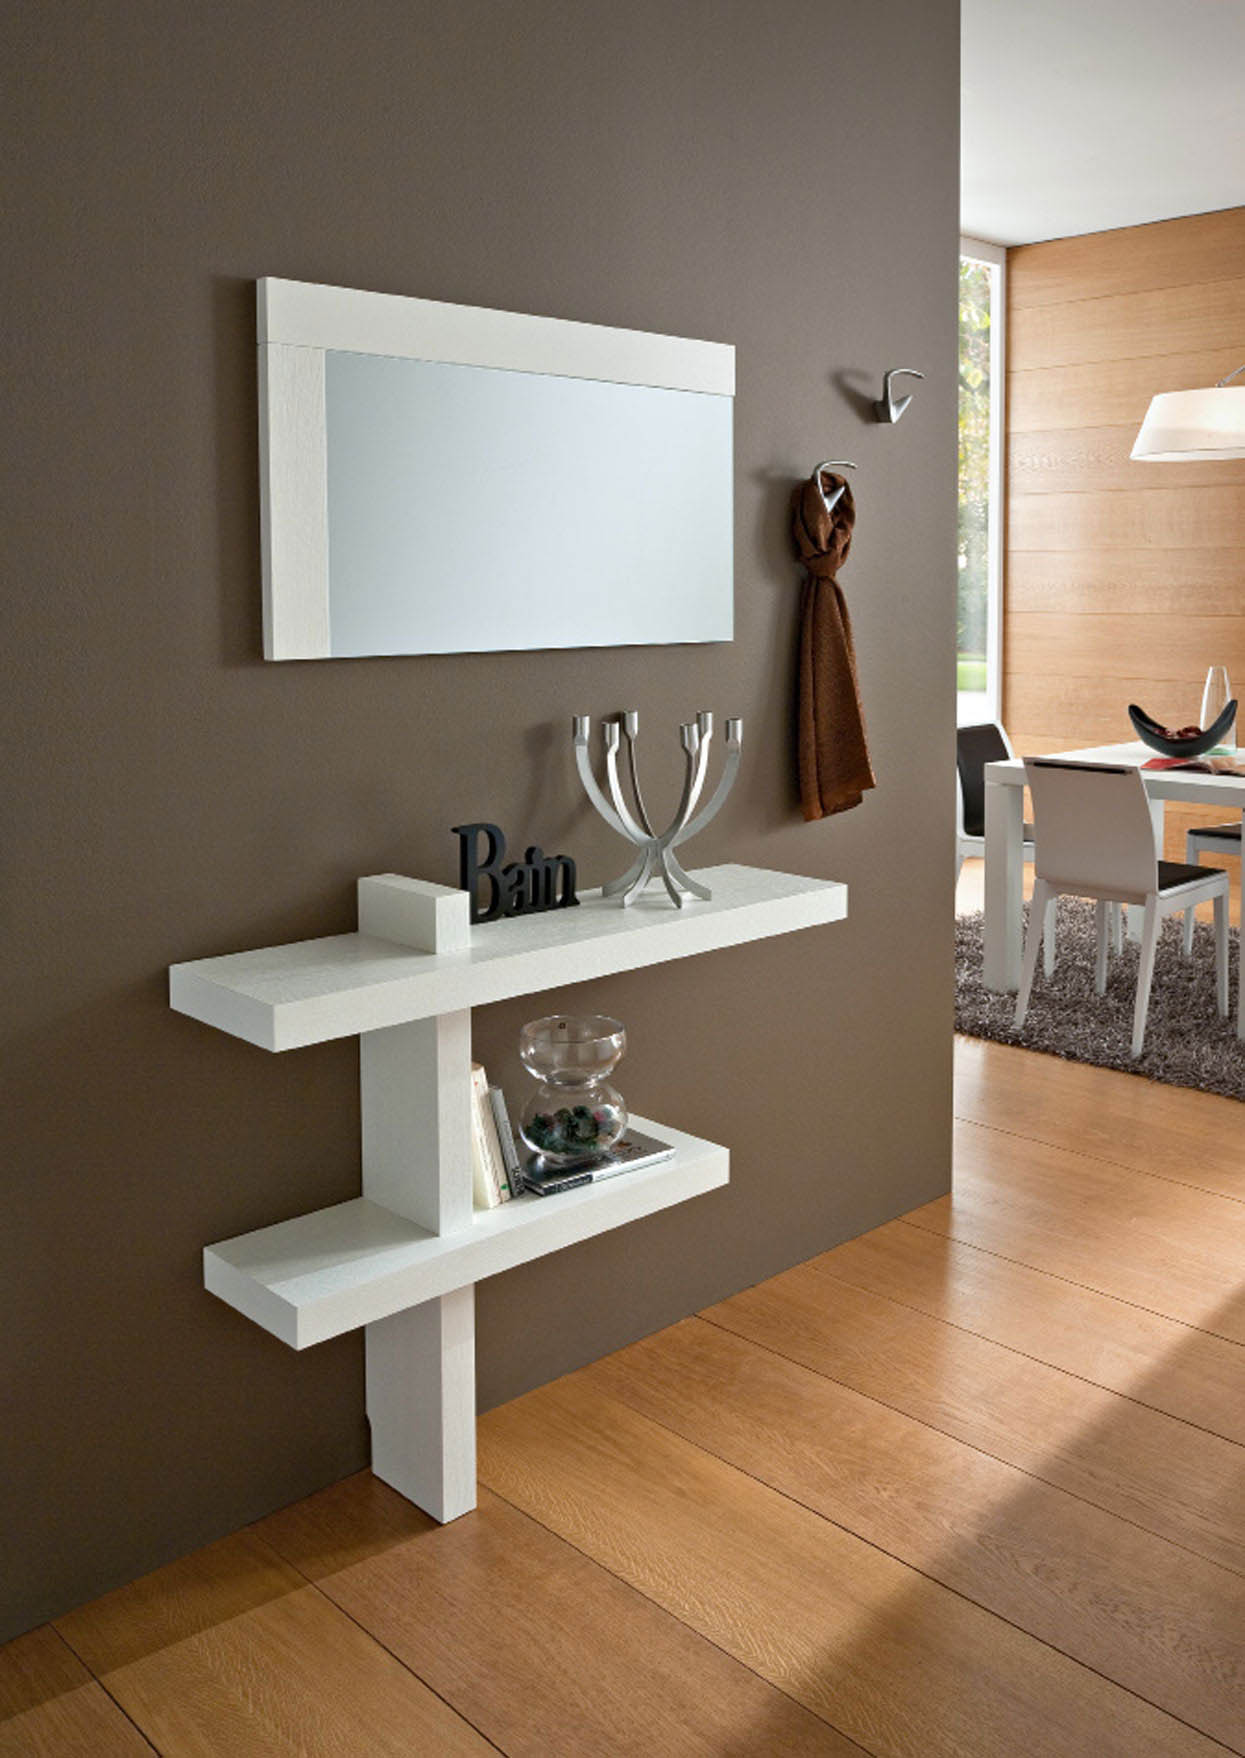 Sandy new consolle mobile ingresso con specchio - Idee per ingressi casa ...